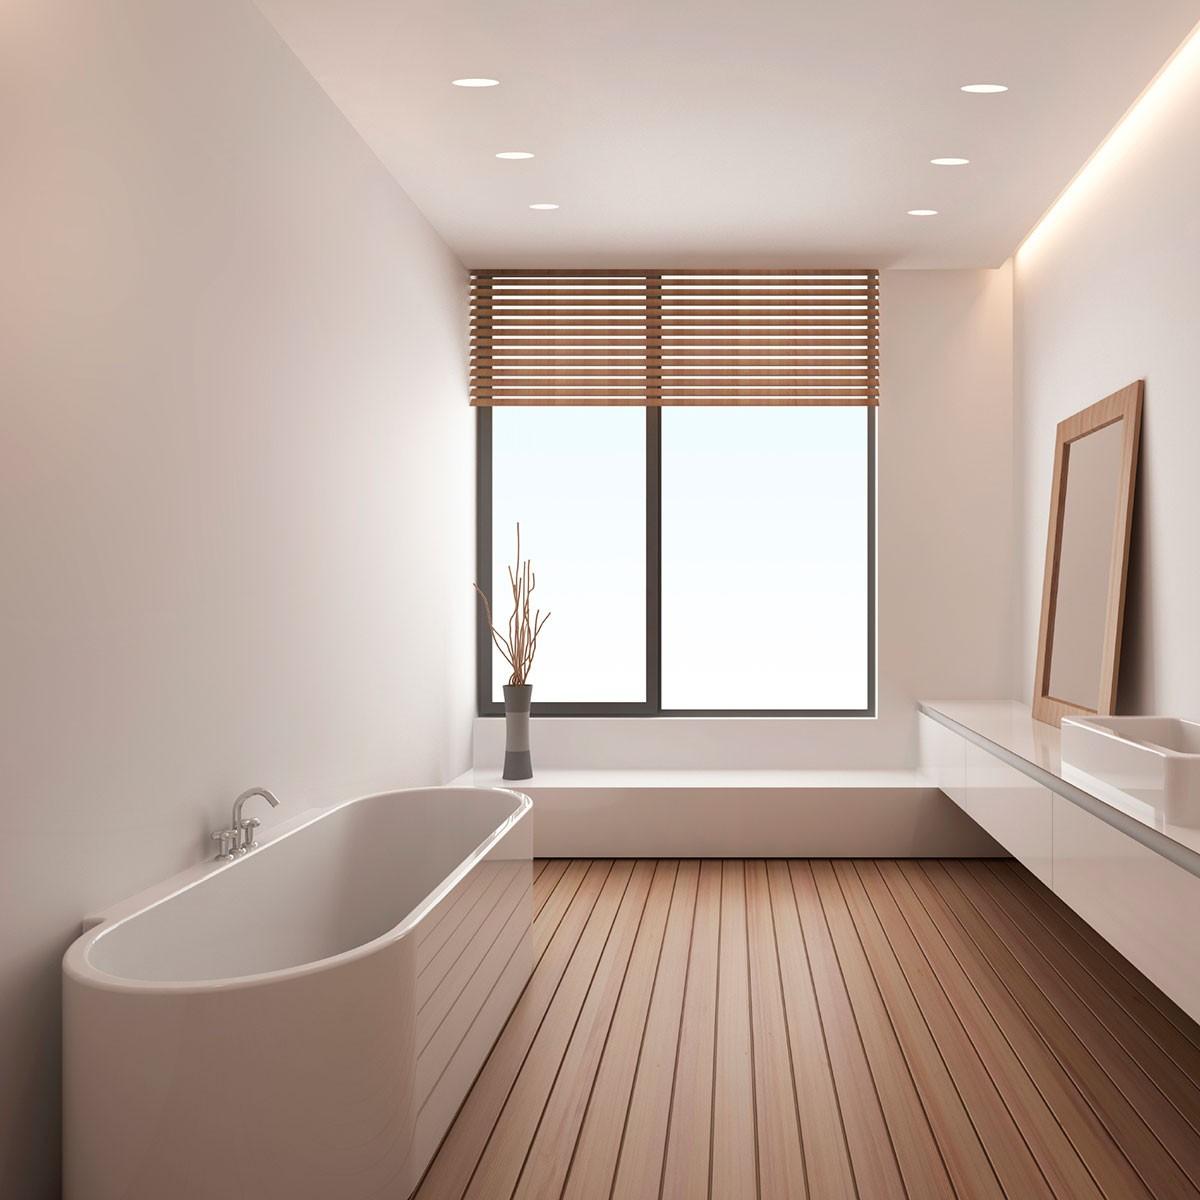 astro trimless round mr16 white bathroom downlight at uk